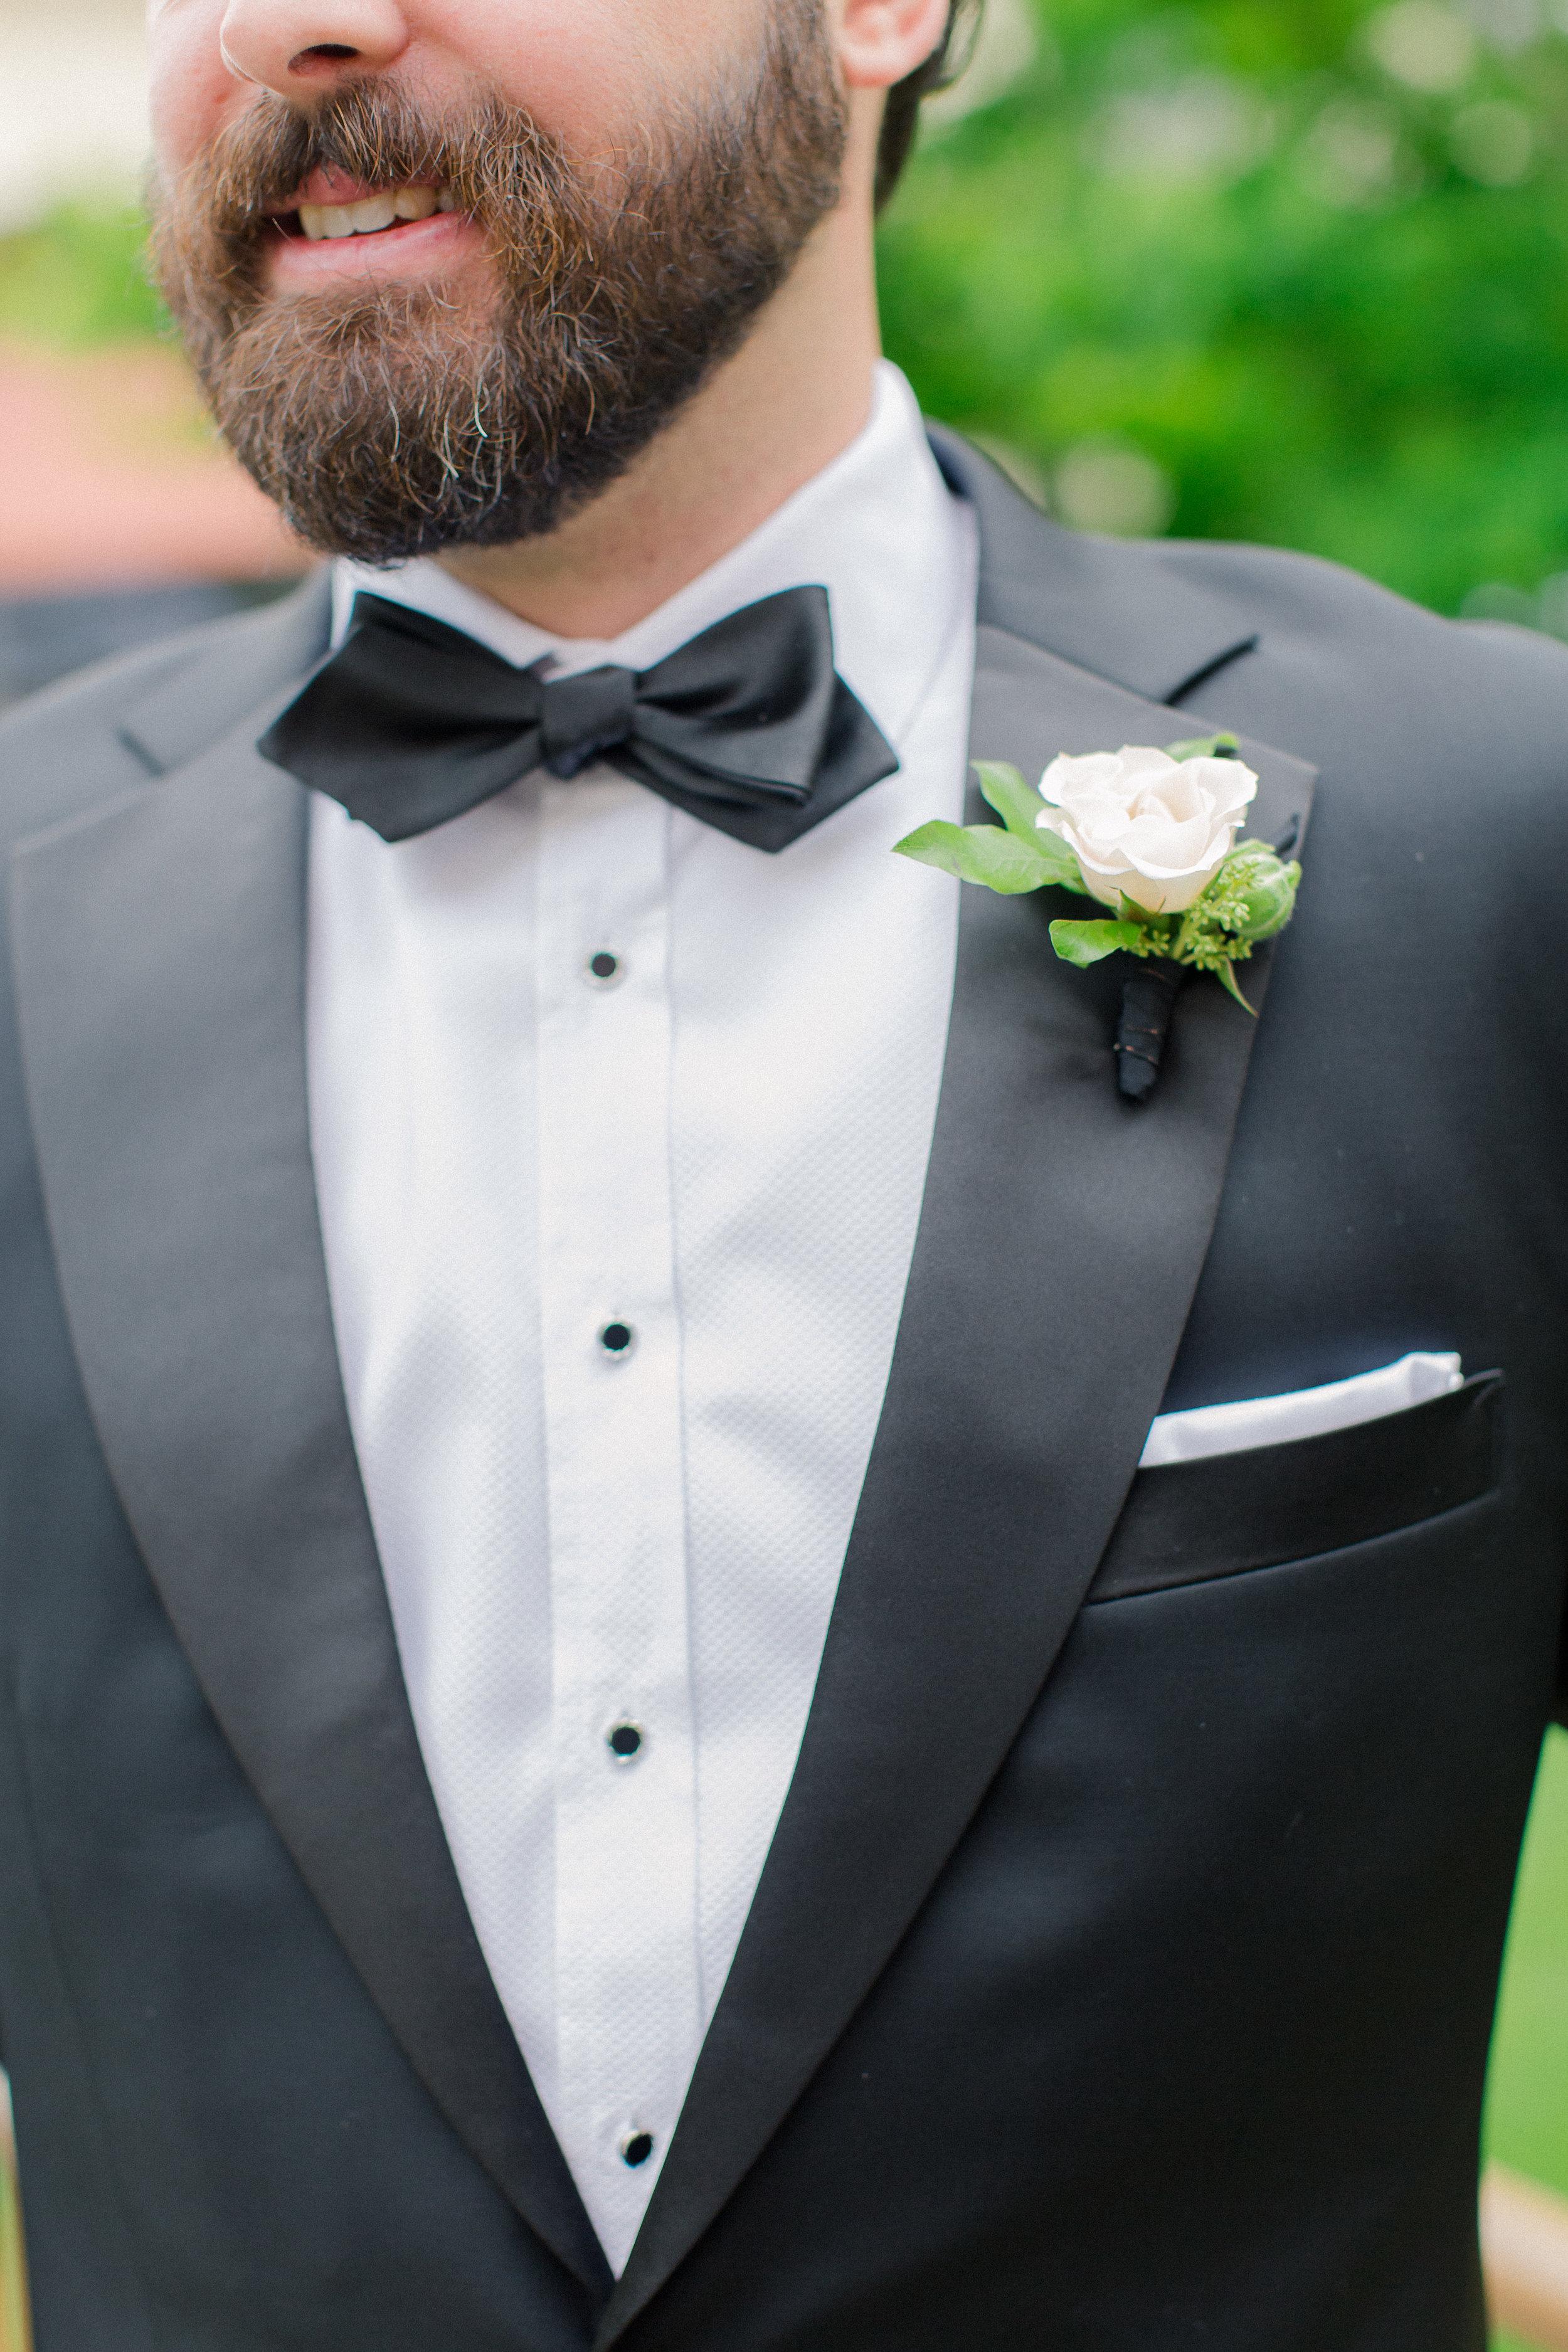 california-wedding-day-lrelyea-events-lori-paladino-photography4.jpg